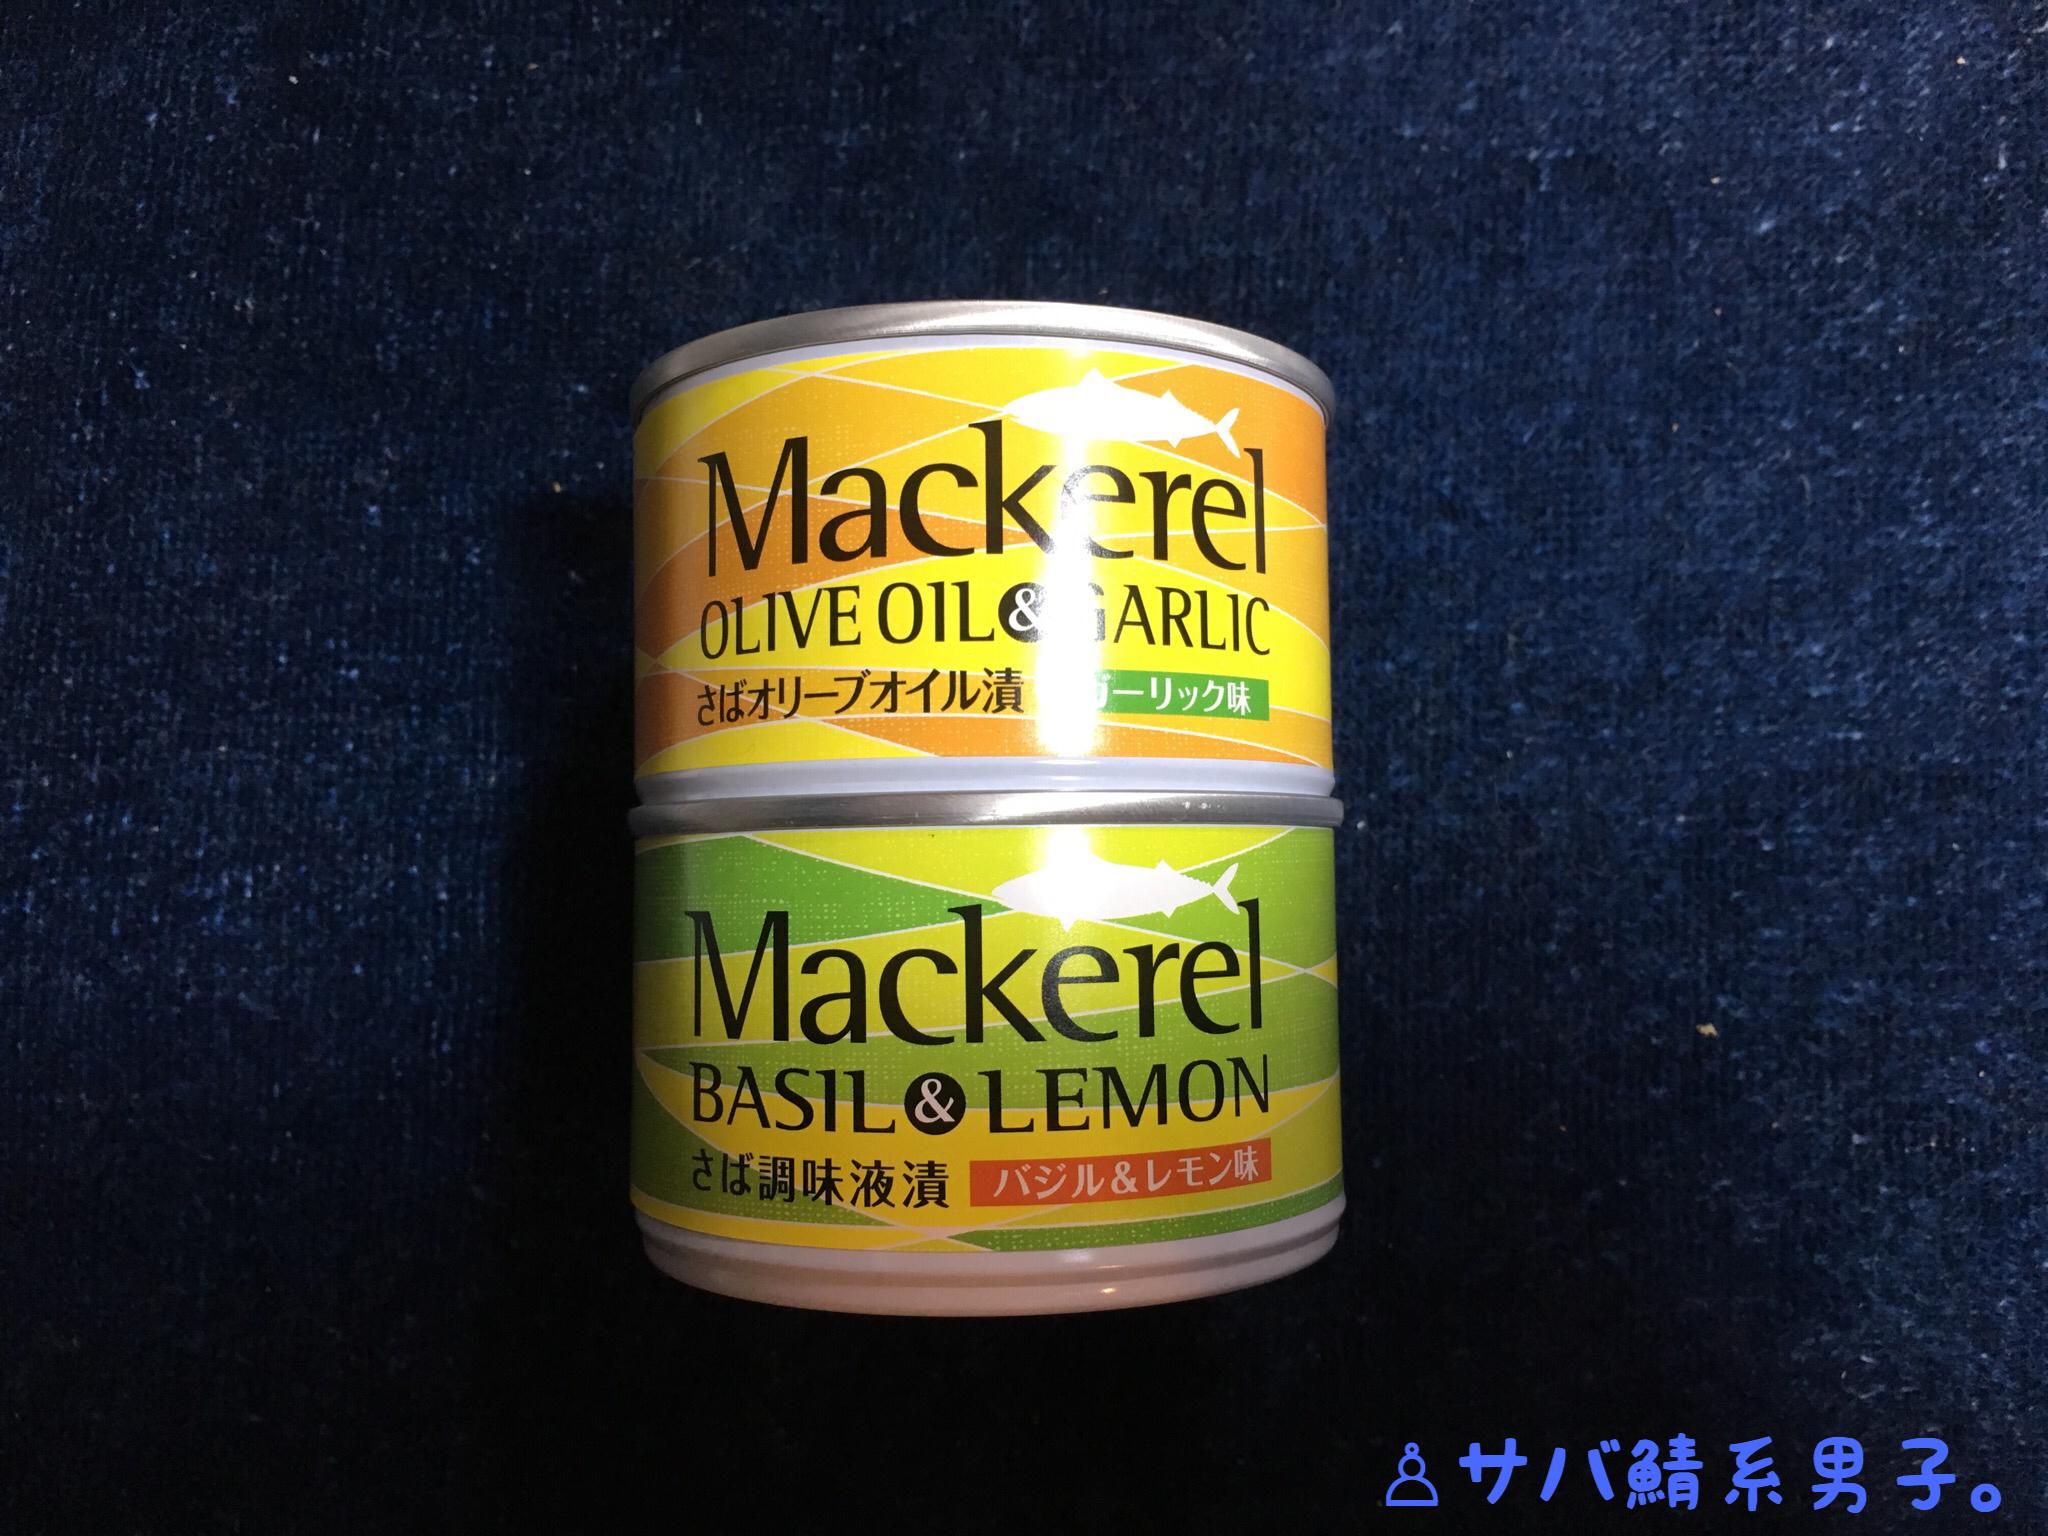 SSKセールス サバ レモン&バジル ガーリック 風味